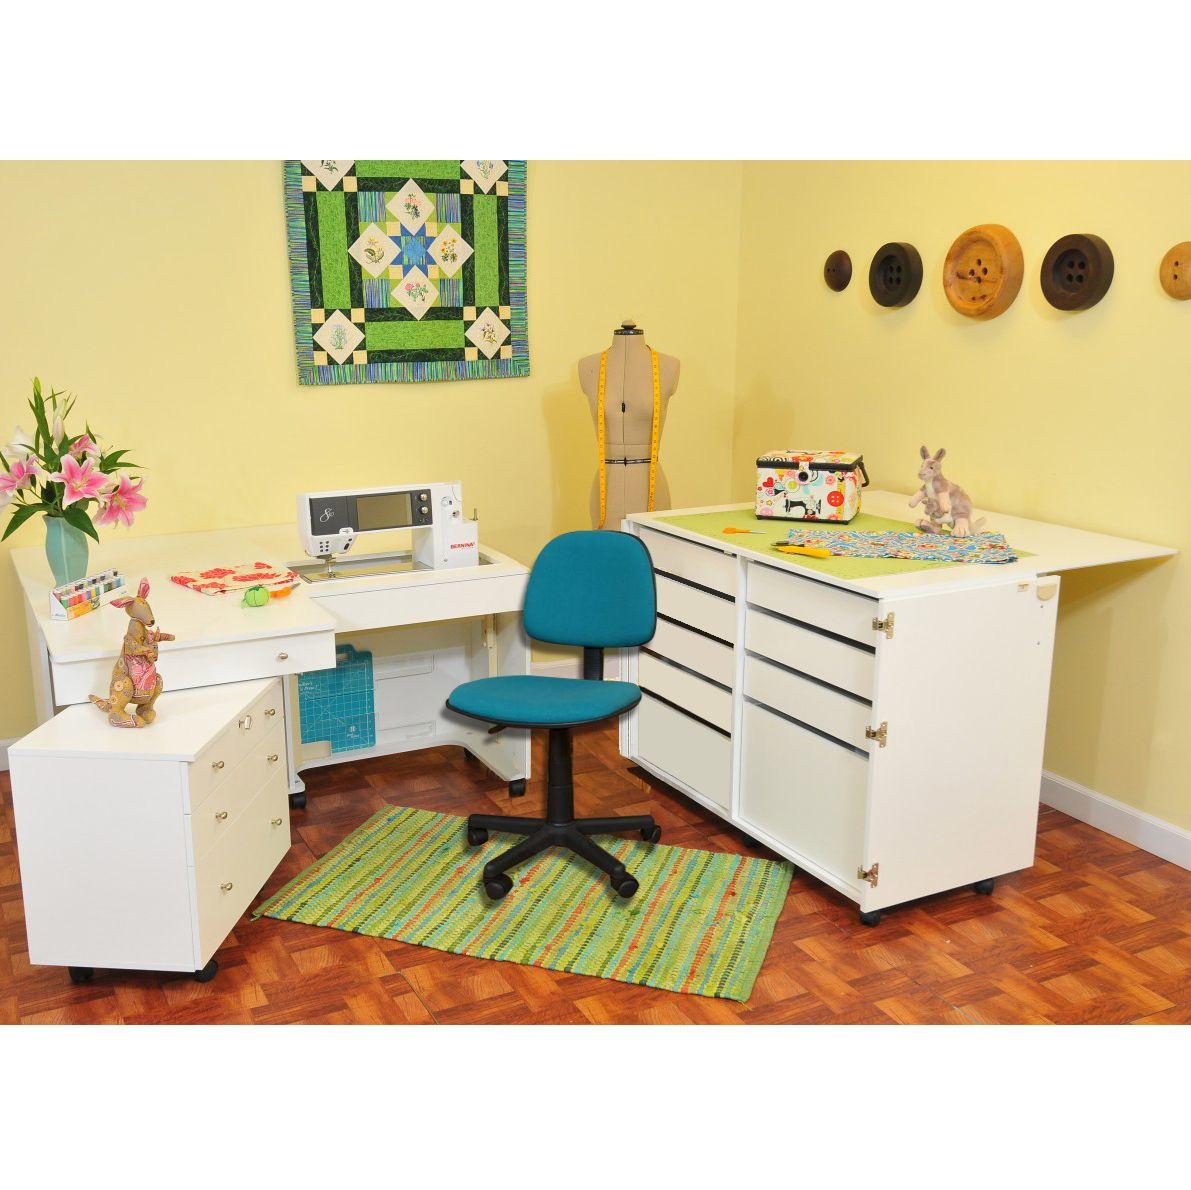 Sewing Machine Cabinets - Kangaroo Kabinets Kangaroo ...